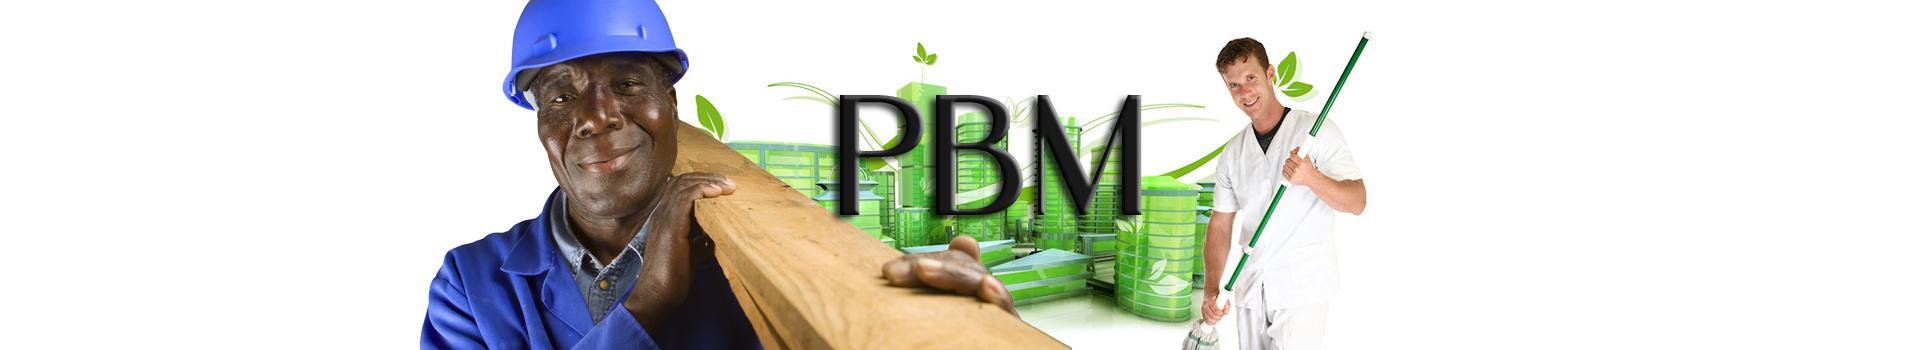 slide3-large-pbm